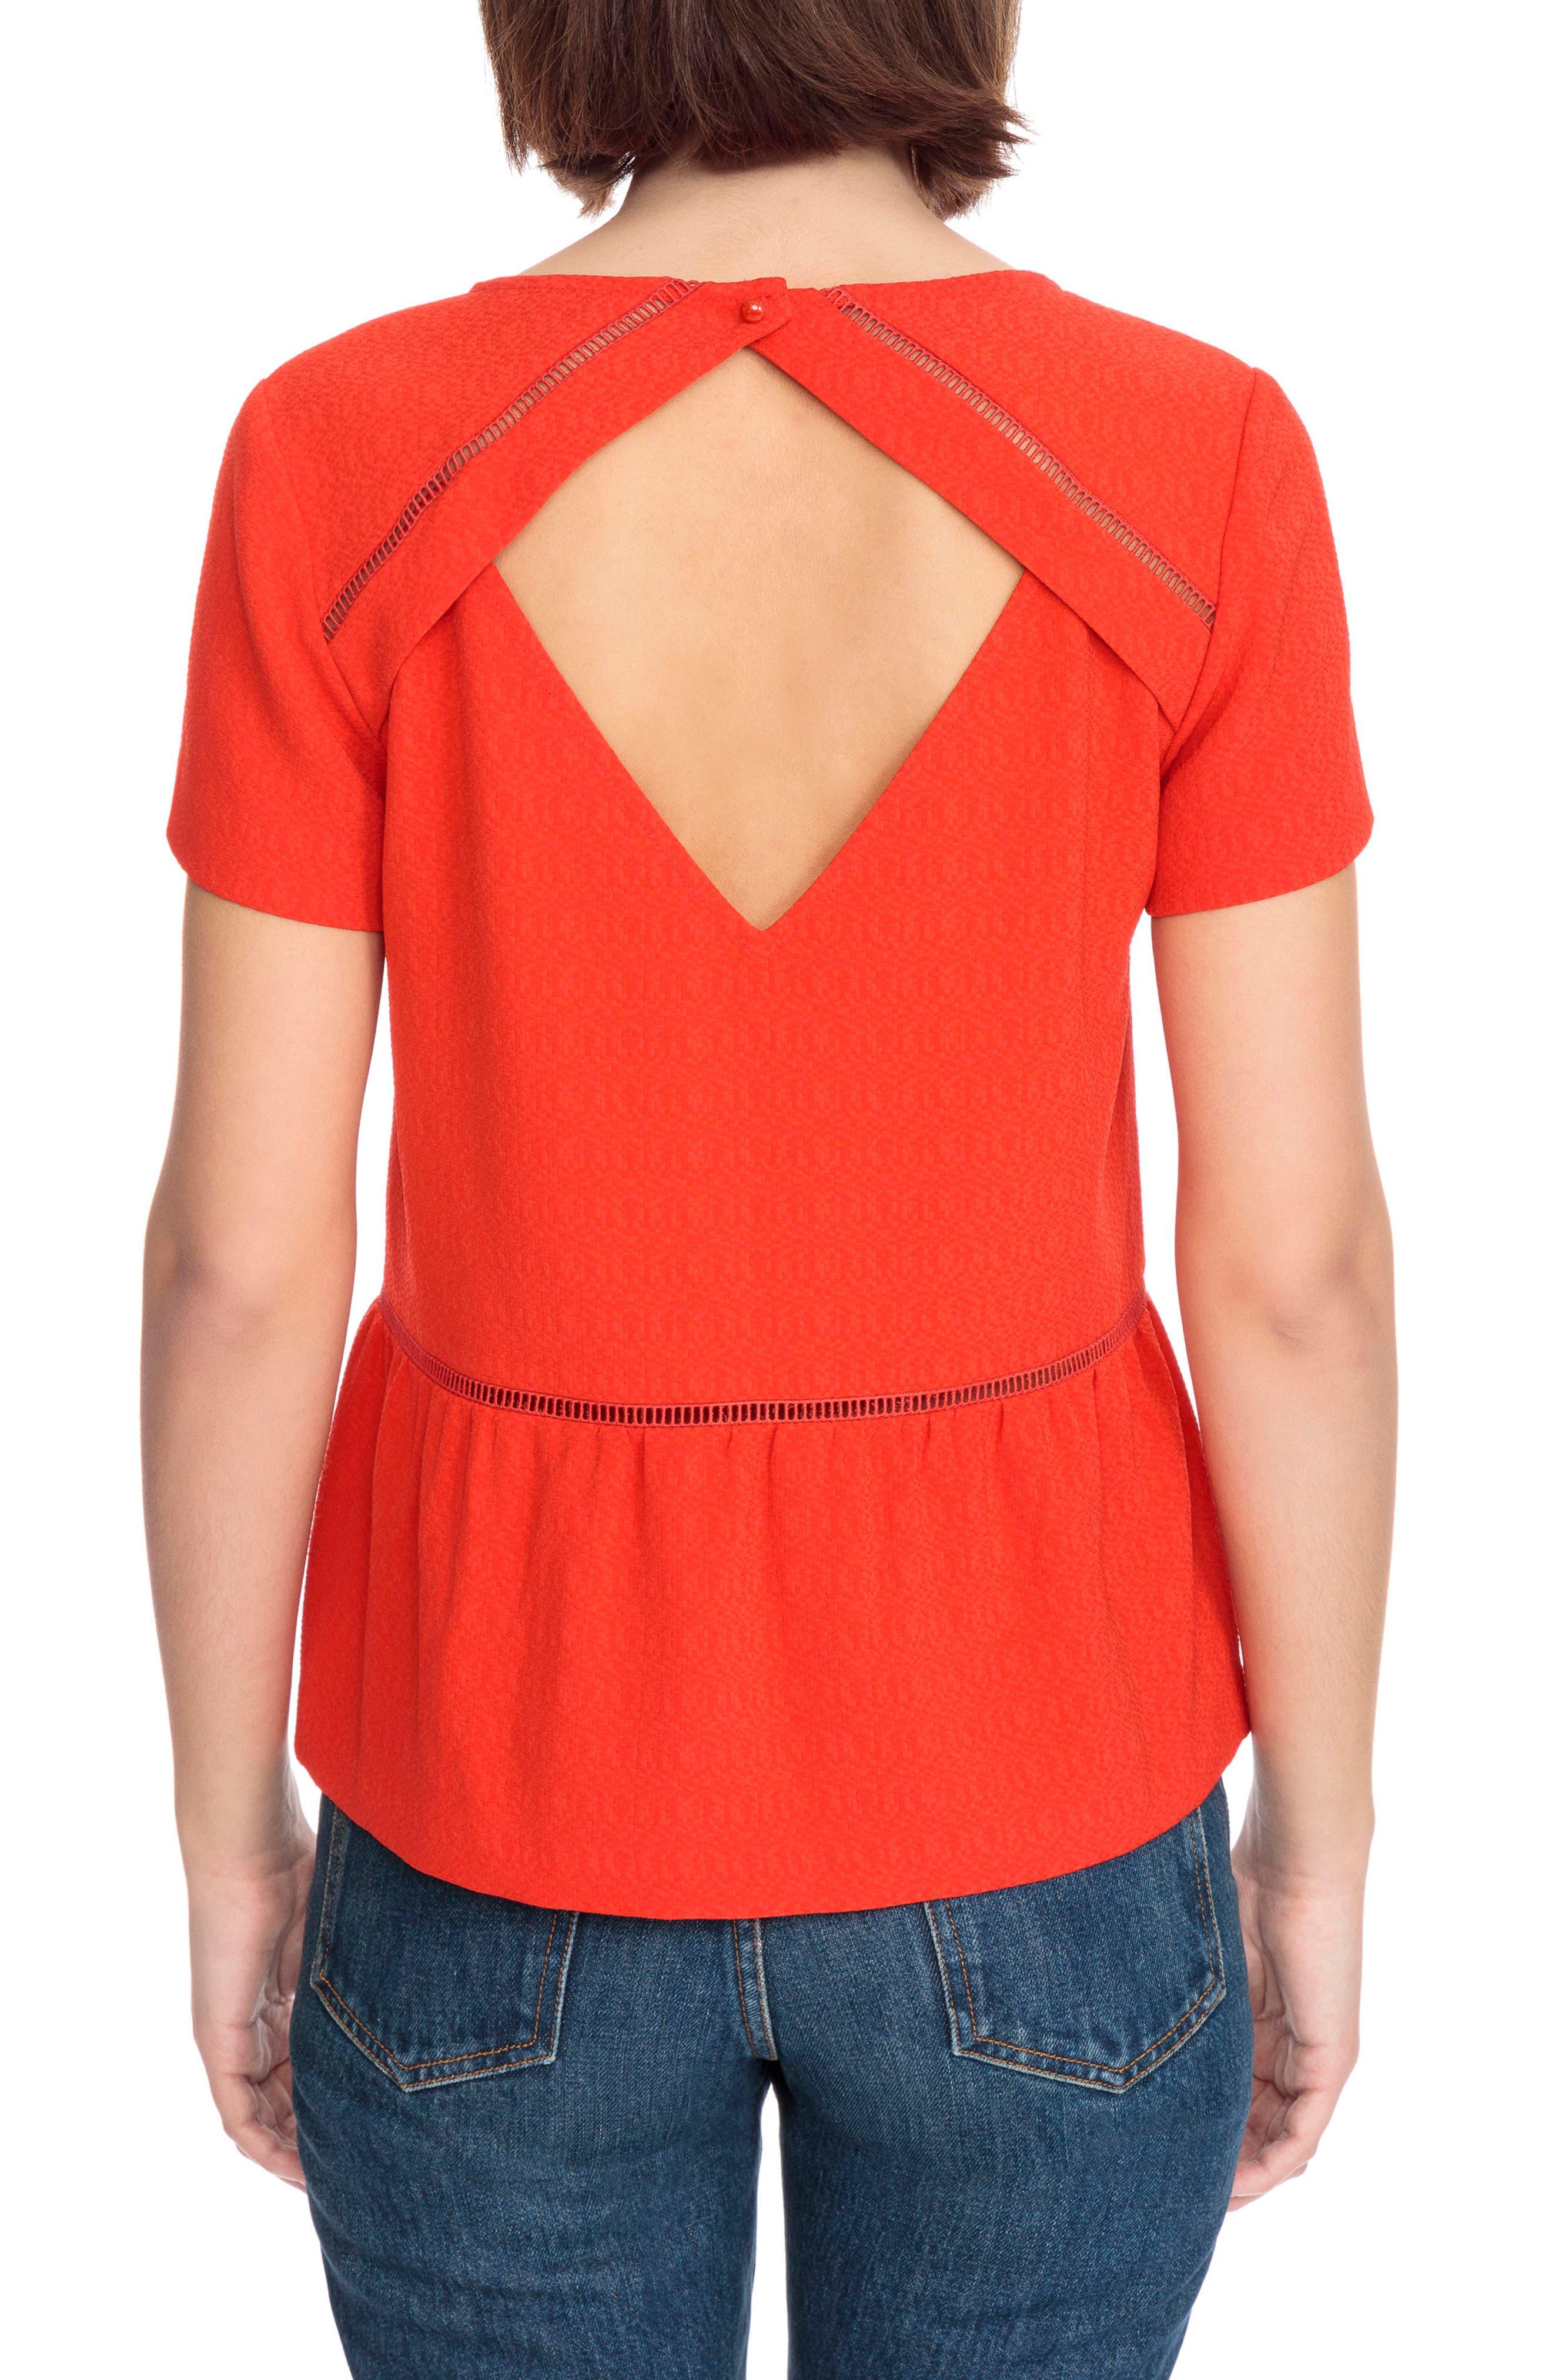 Amanda Ladder Stitch Blouse,                             Alternate thumbnail 2, color,                             Coral Red